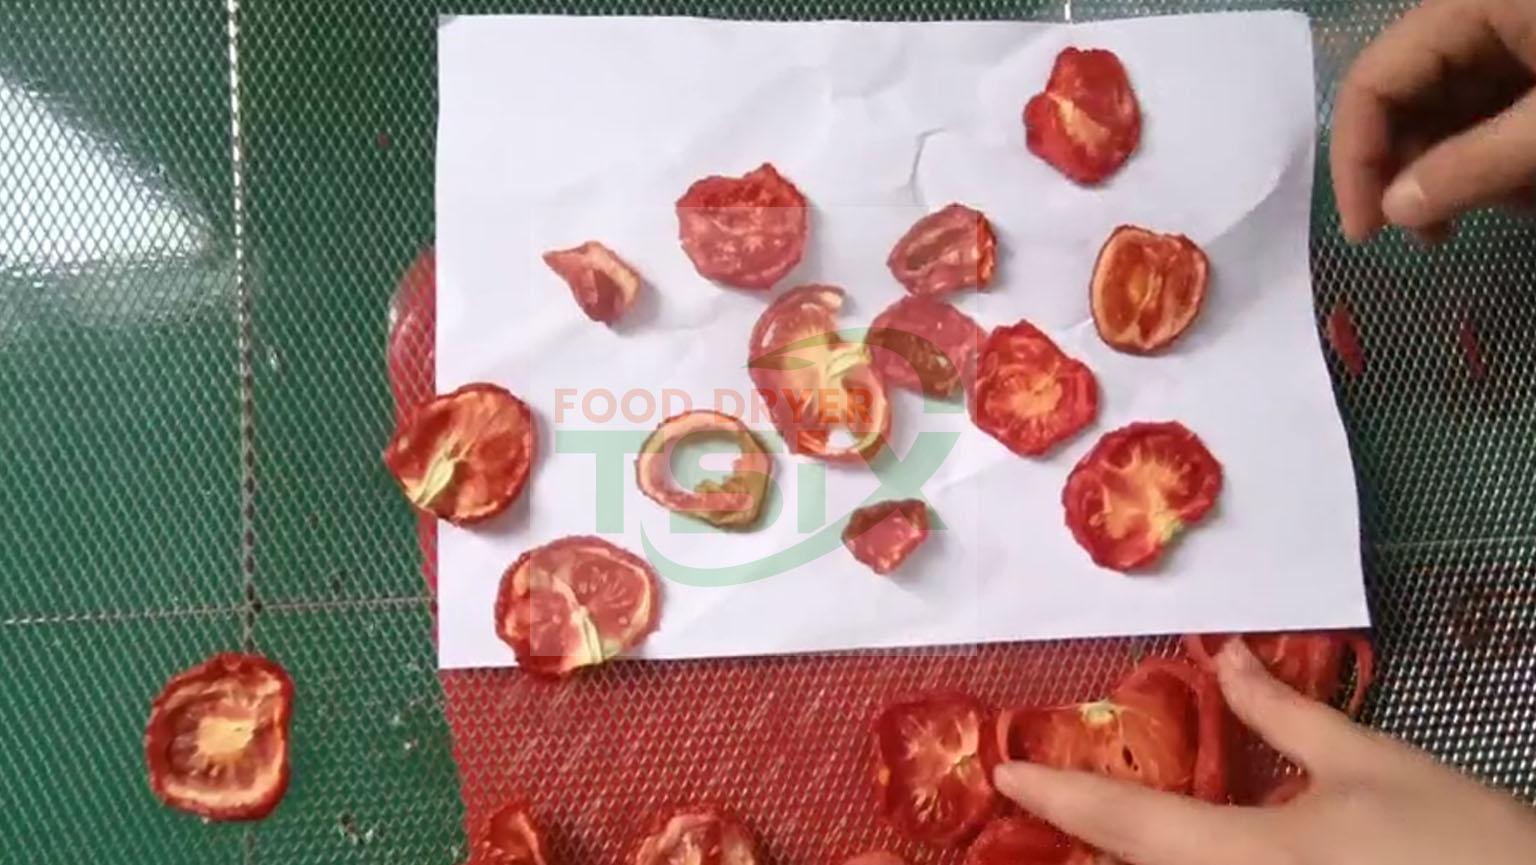 300kg Tomato Drying Machine Commercial Tomato Dehydrator Machine -DPHG030S-G